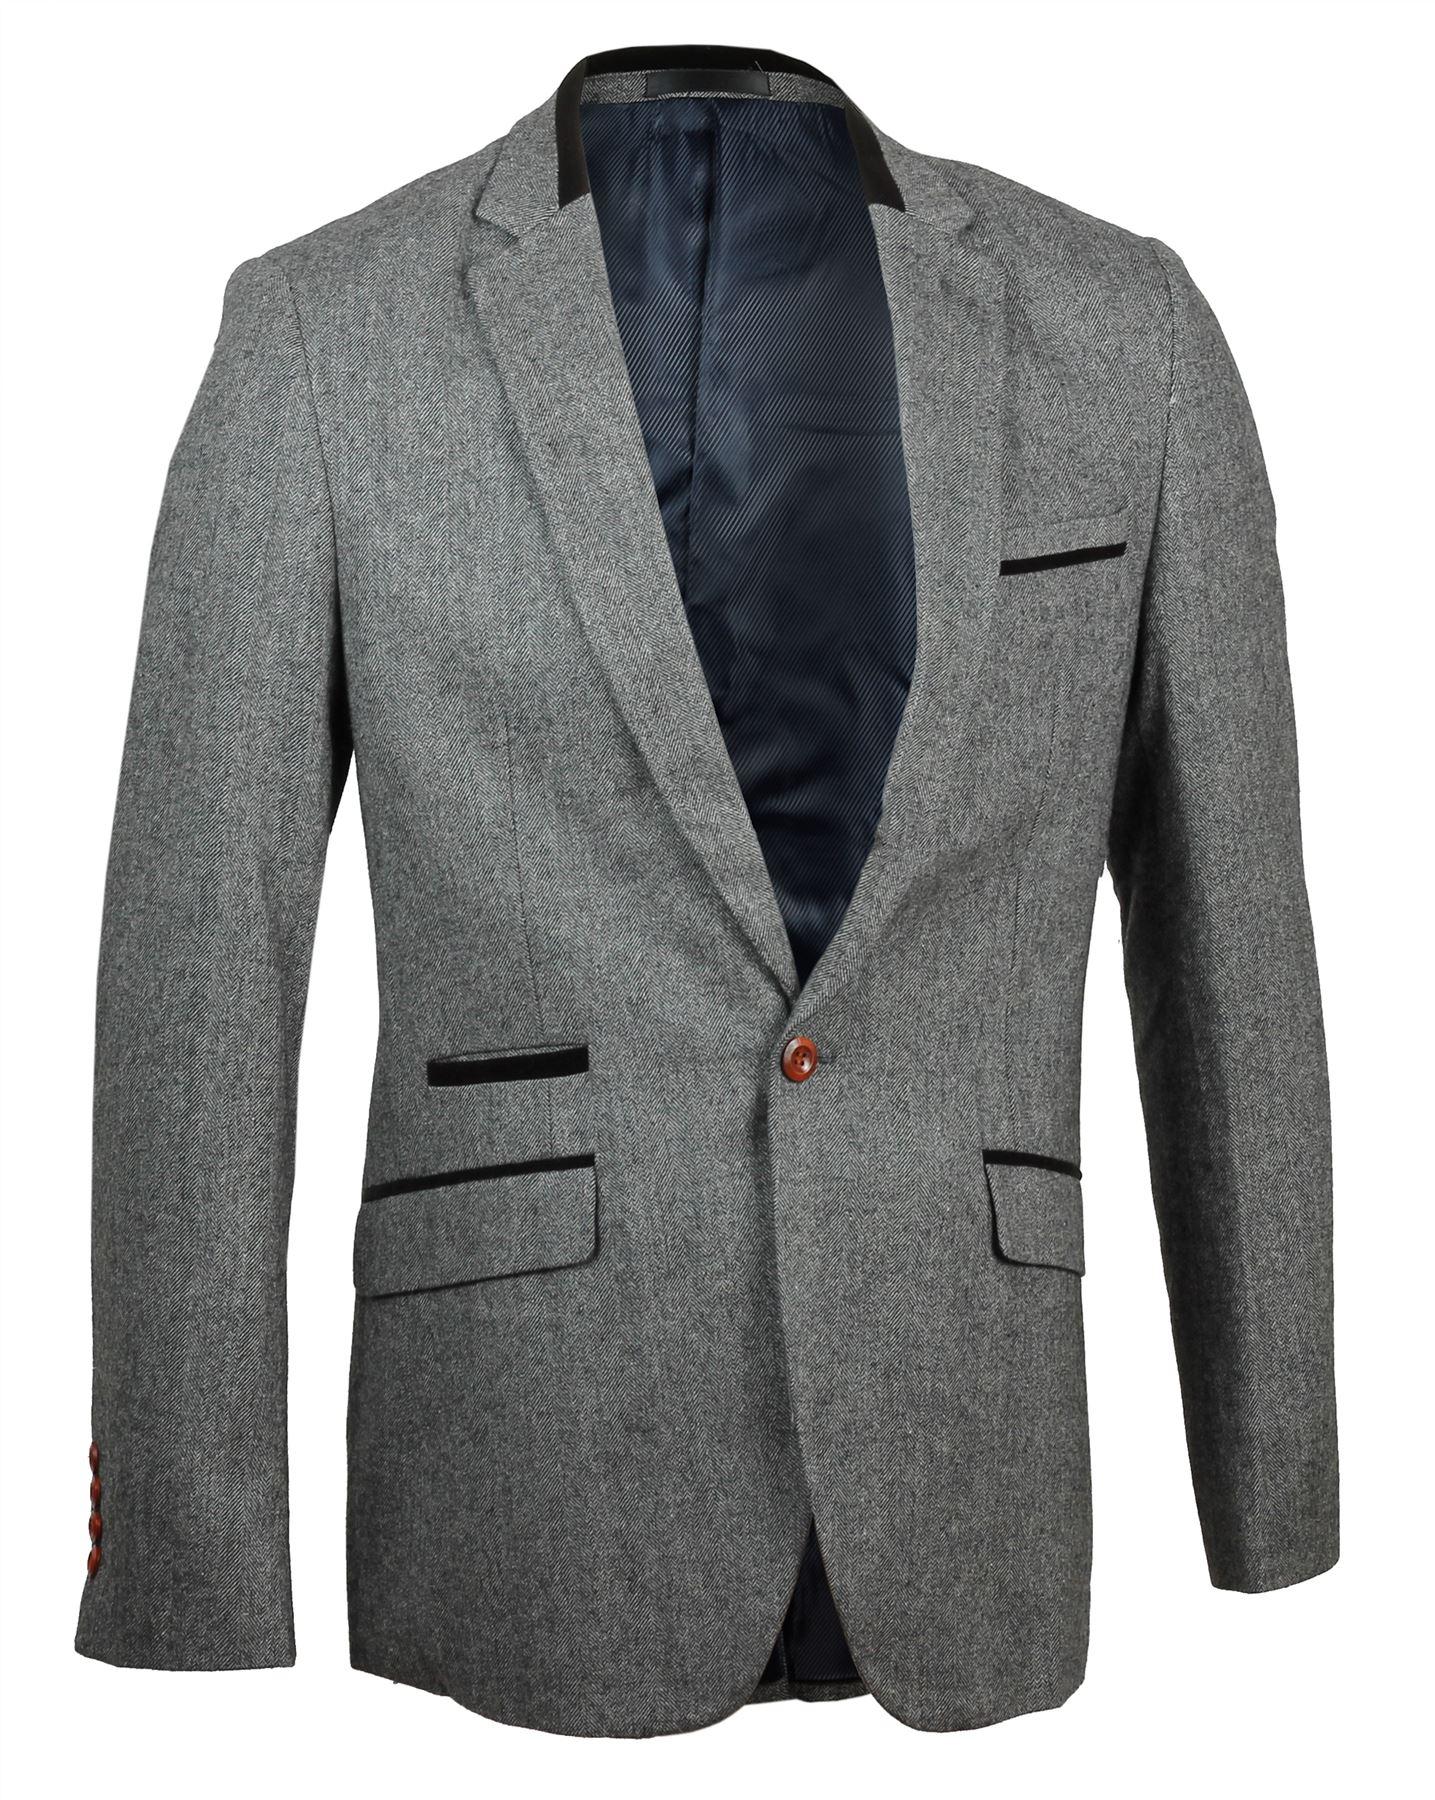 mens inc international concepts grey 1-button blazer sz xl slim fit nwt $ see more like this Chaps Blazer Suit Jacket Mens 38 Regular Slim Fit Grey 2 .